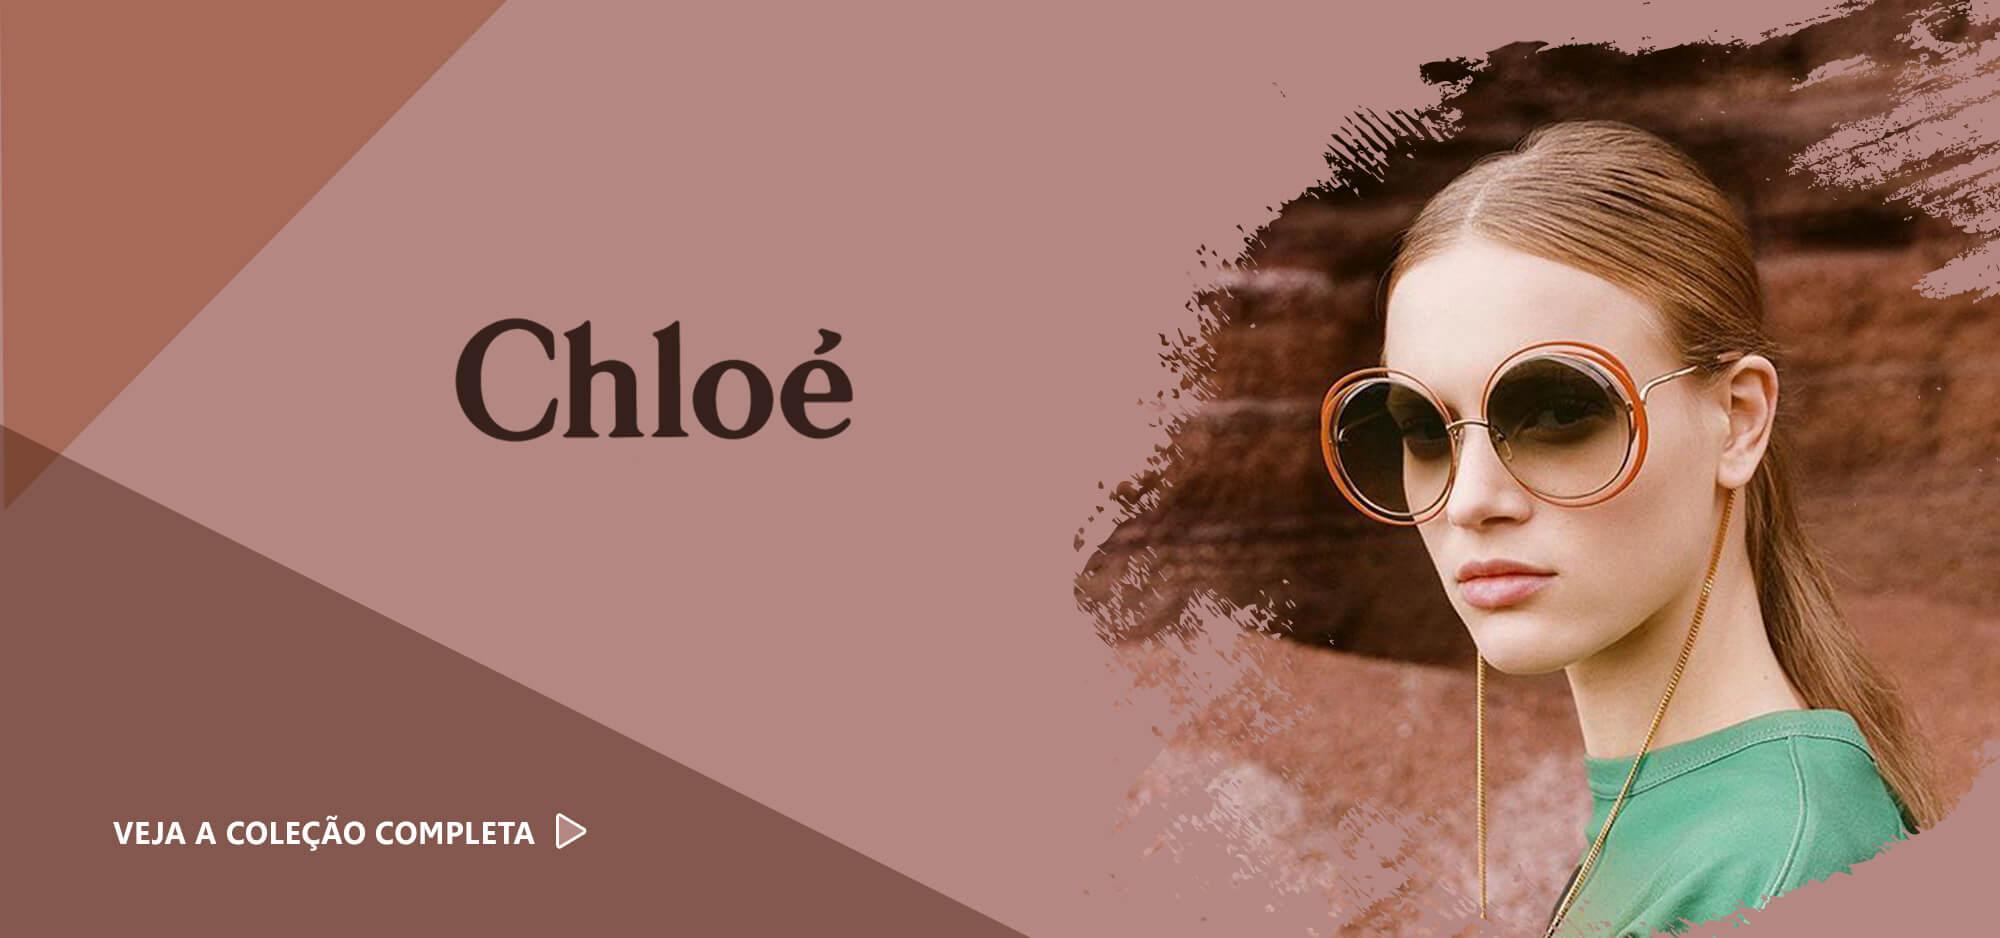 Banner Chloé